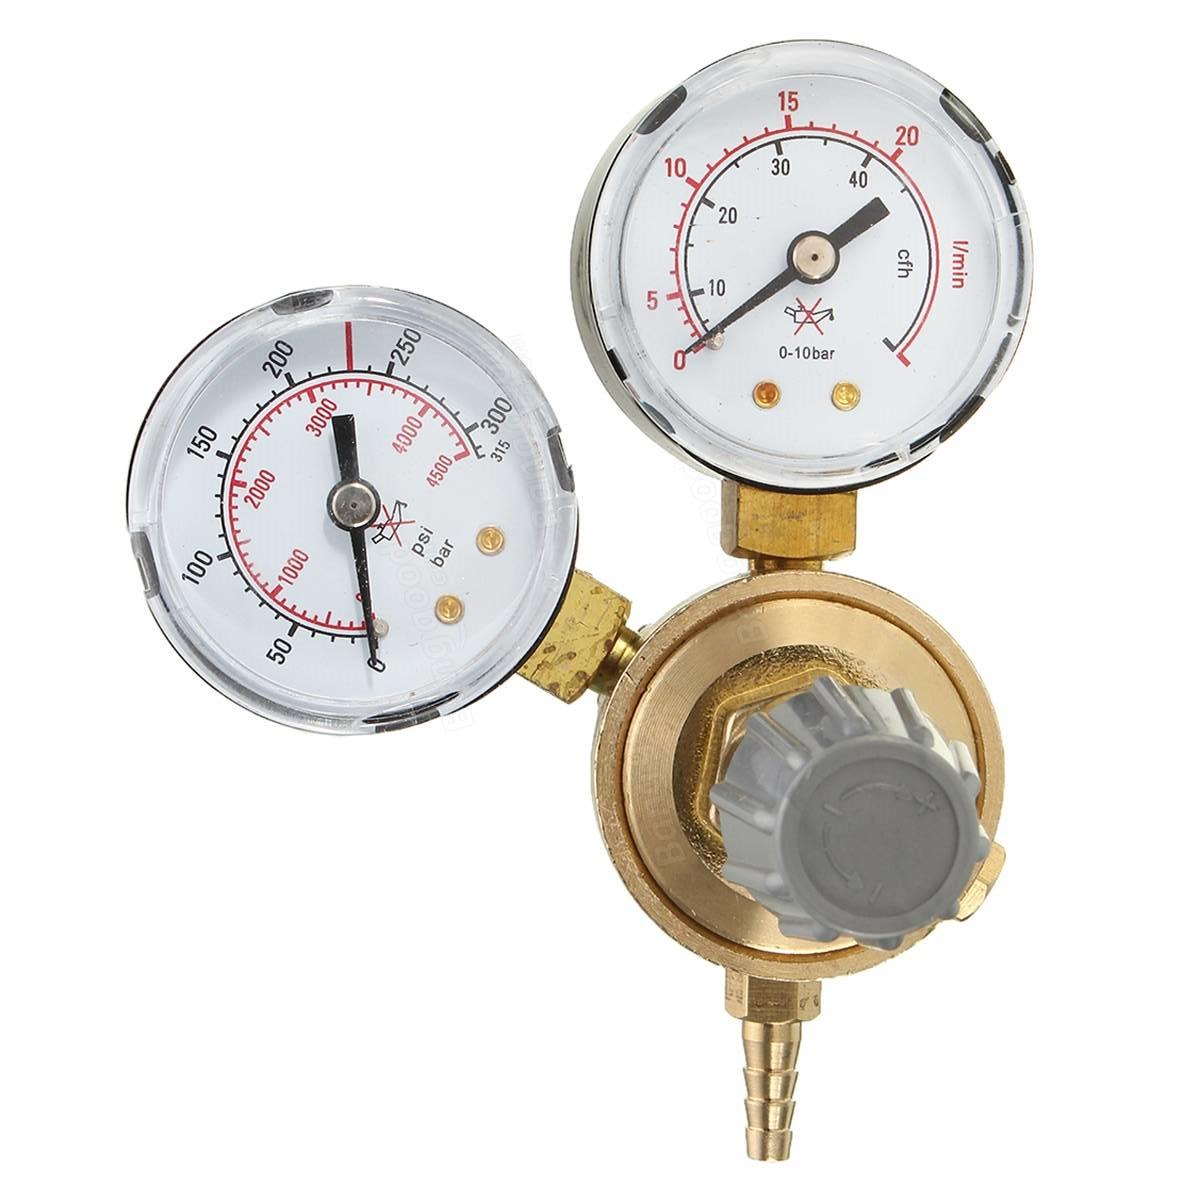 Euroacque regulátor tlaku pro plnitelnou CO2 nádobu RIDUXC02